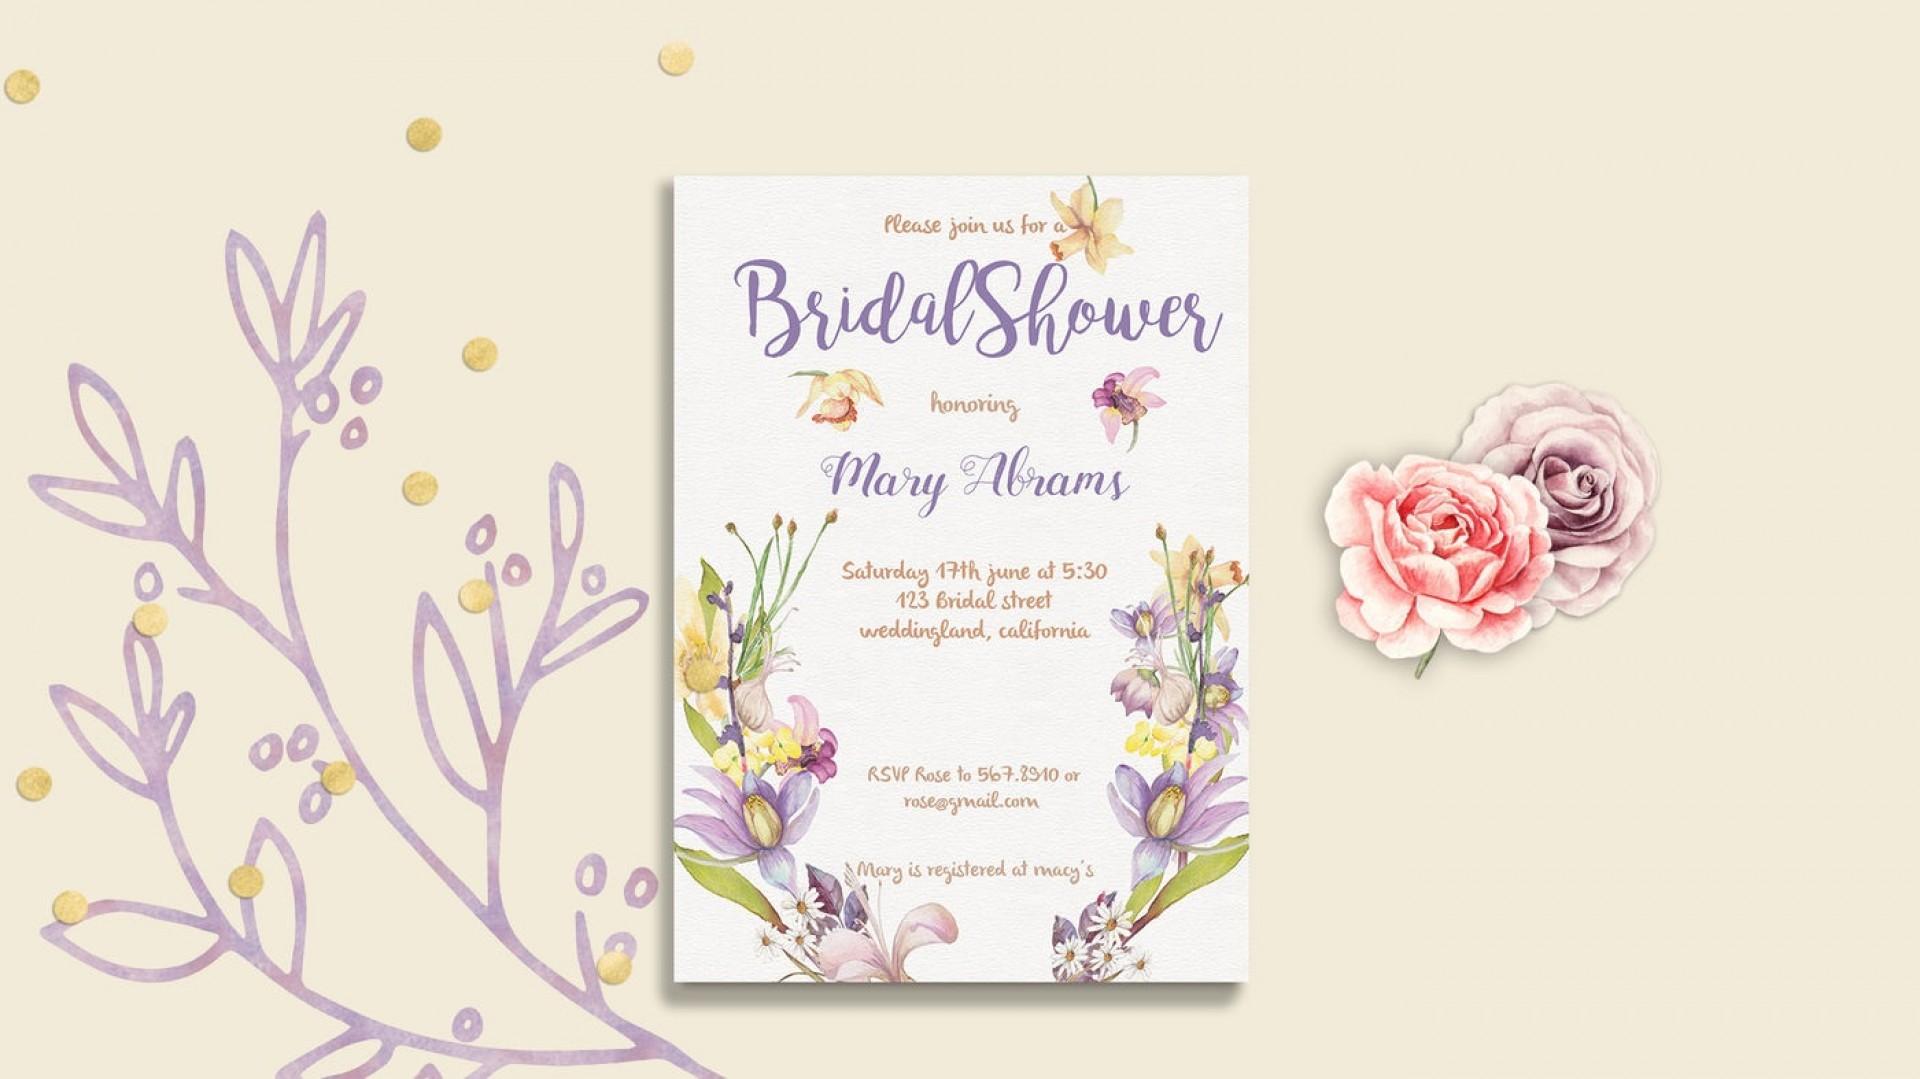 009 Fascinating Bridal Shower Card Template Inspiration  Invitation Free Download Bingo1920